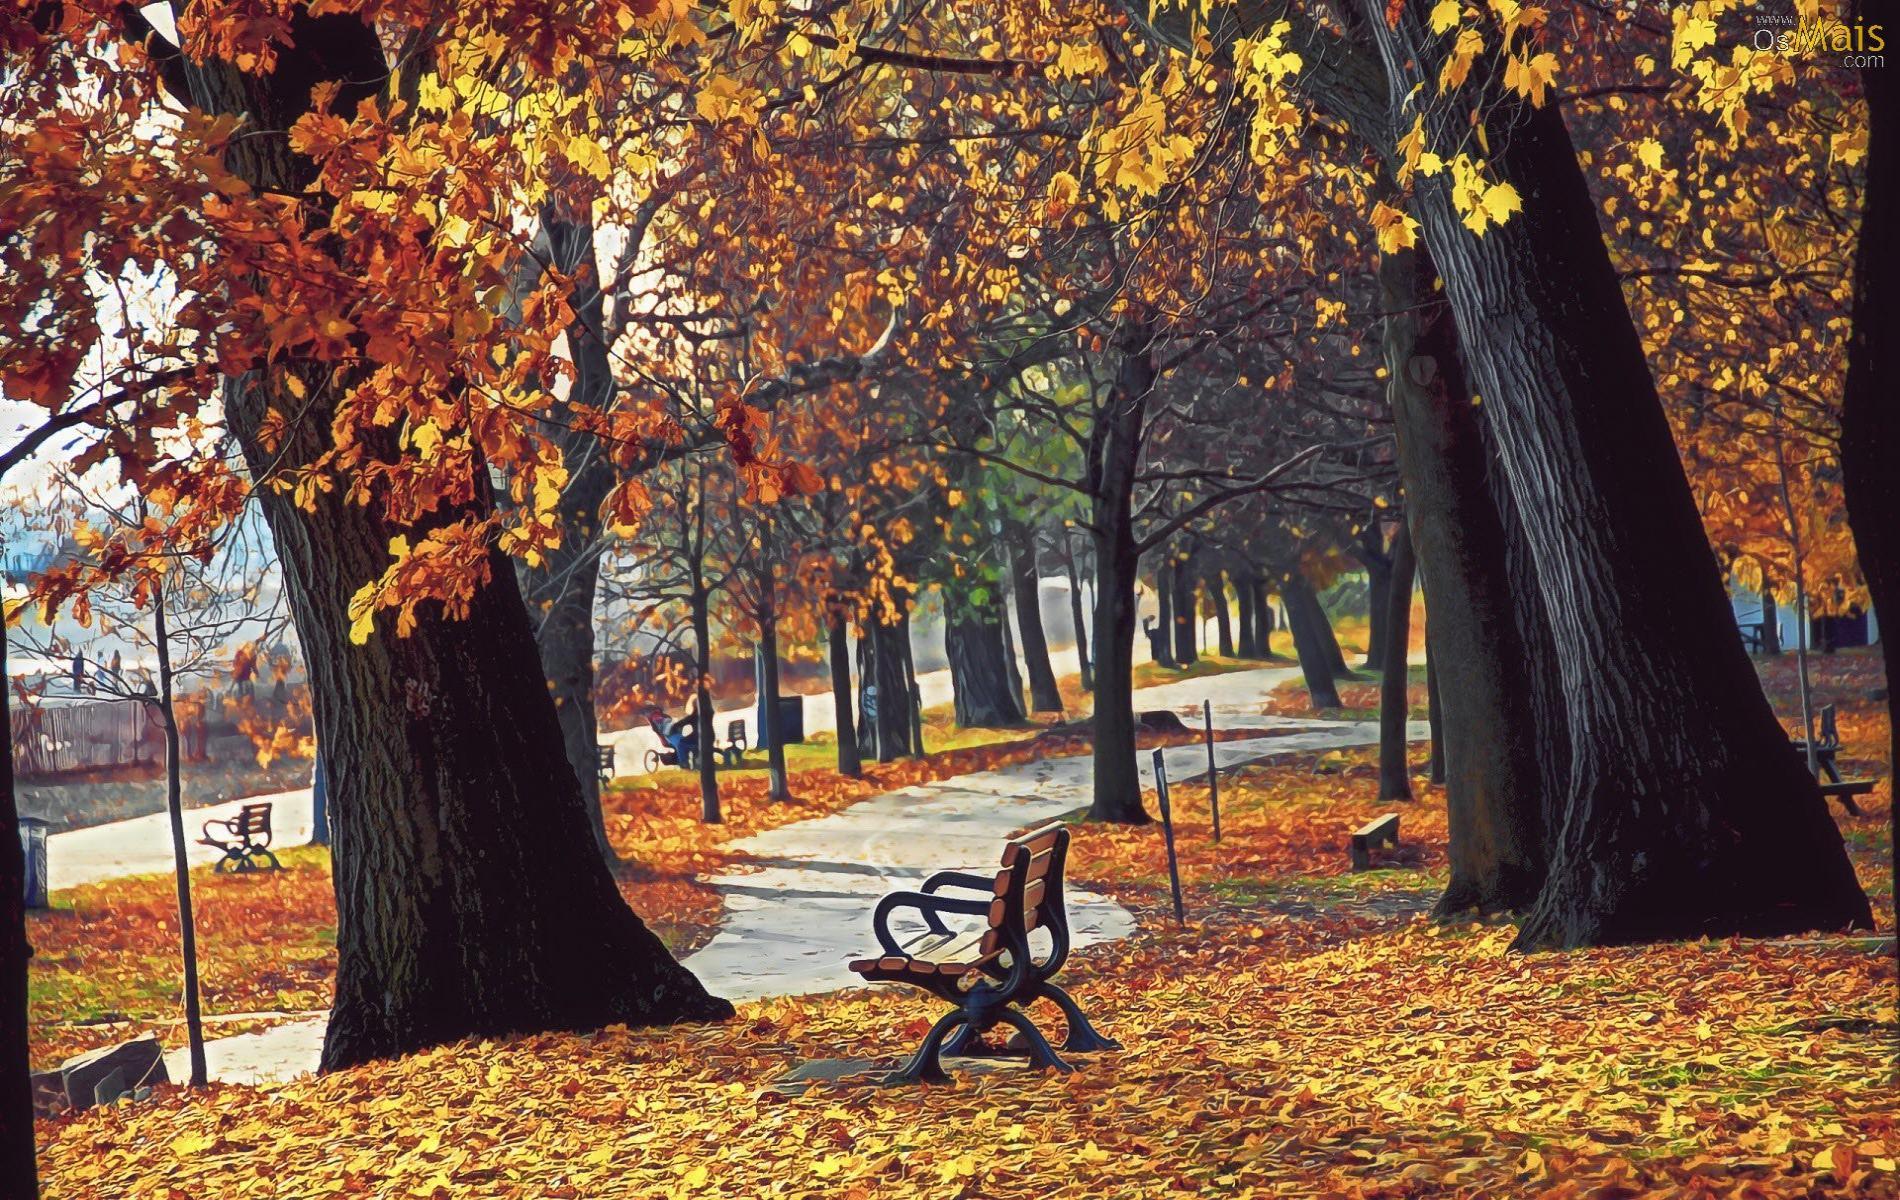 Mis Fondos Para Fotos Gratis: Fondos Otoño, Wallpapers Autumn, Fondos De Pantalla De Otoño